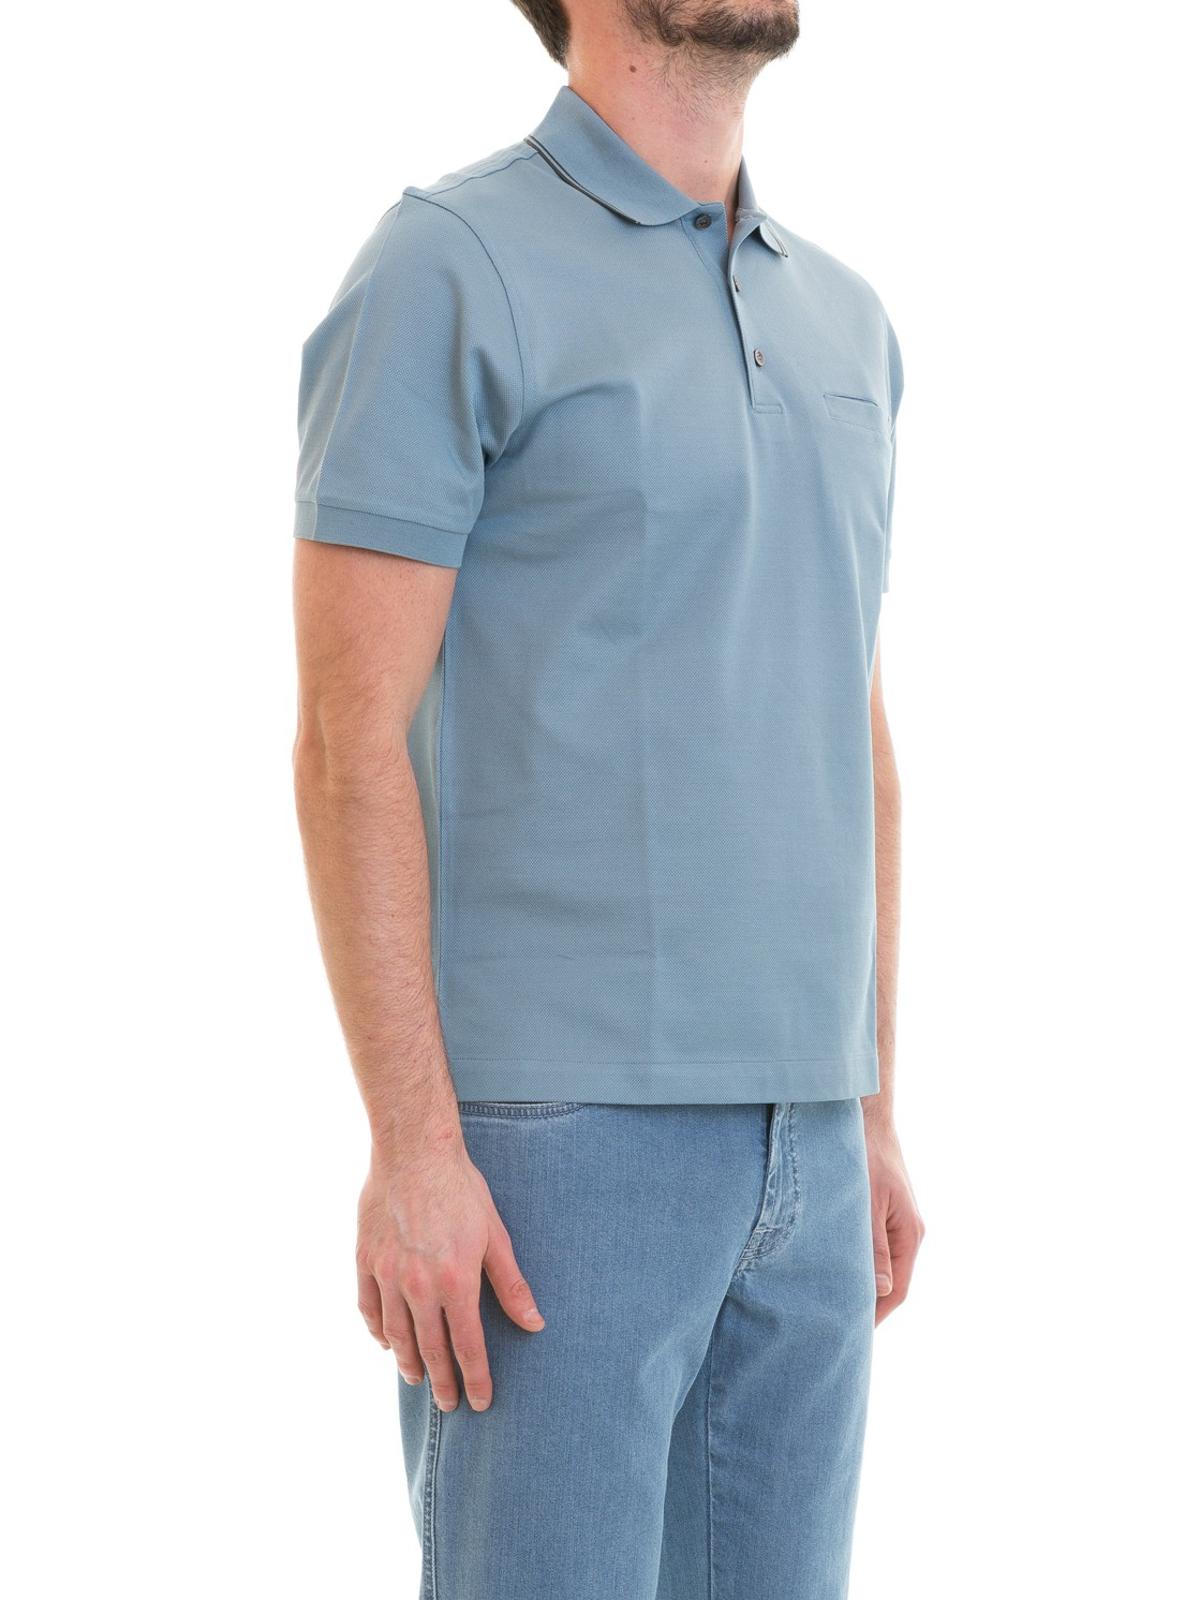 b25a3b69 iKRIX BRIONI: polo shirts - Chest pocket light blue cotton polo